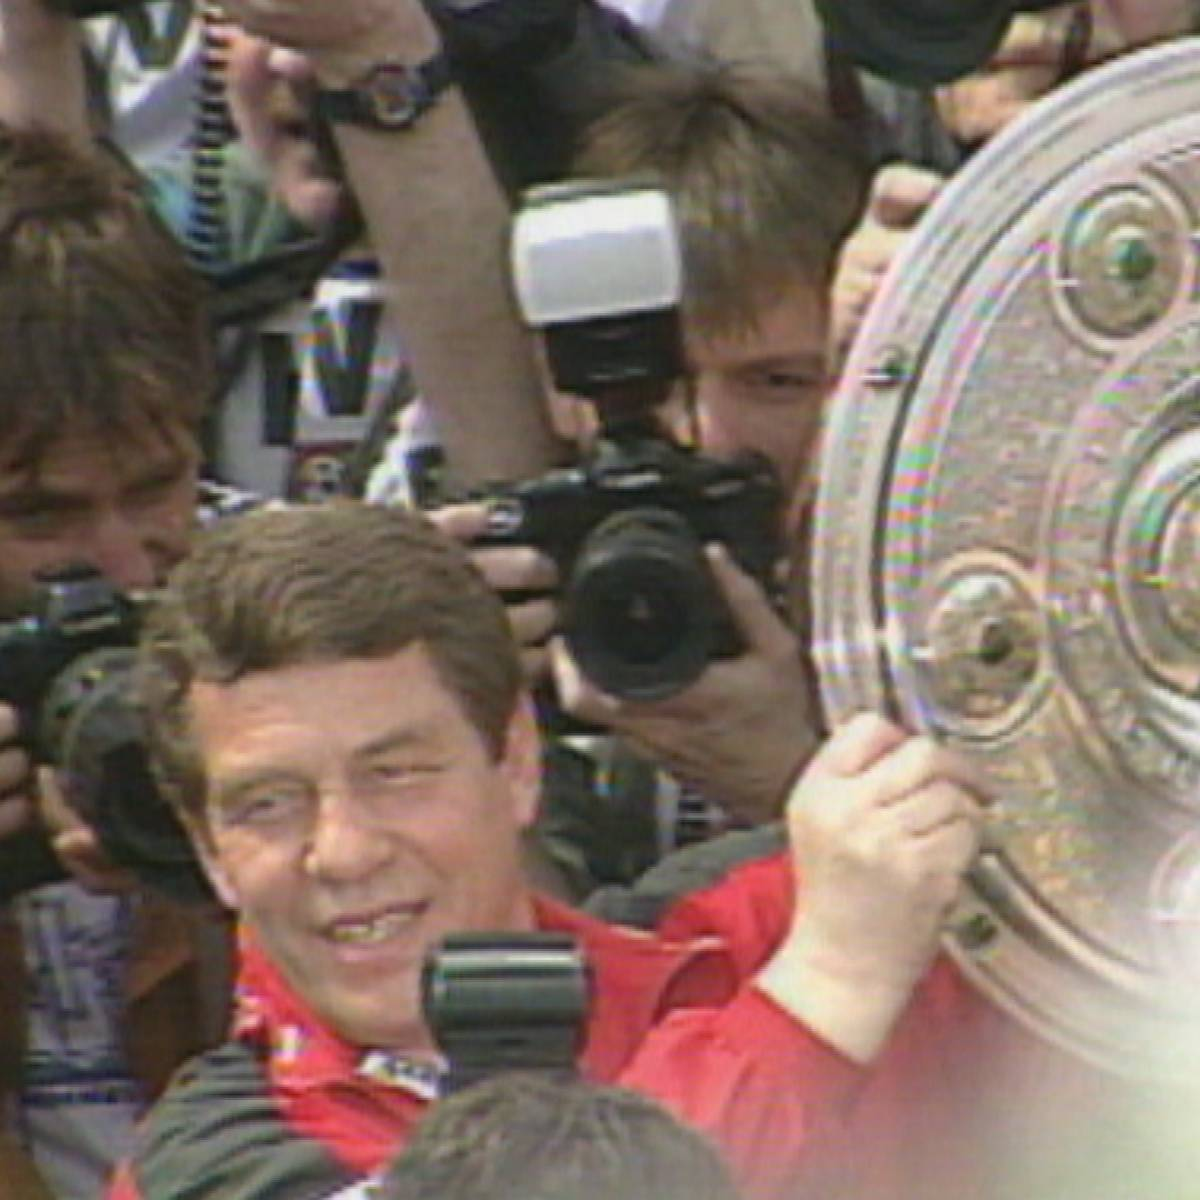 Meister als Aufsteiger: Rehhagels große Rache an den Bayern